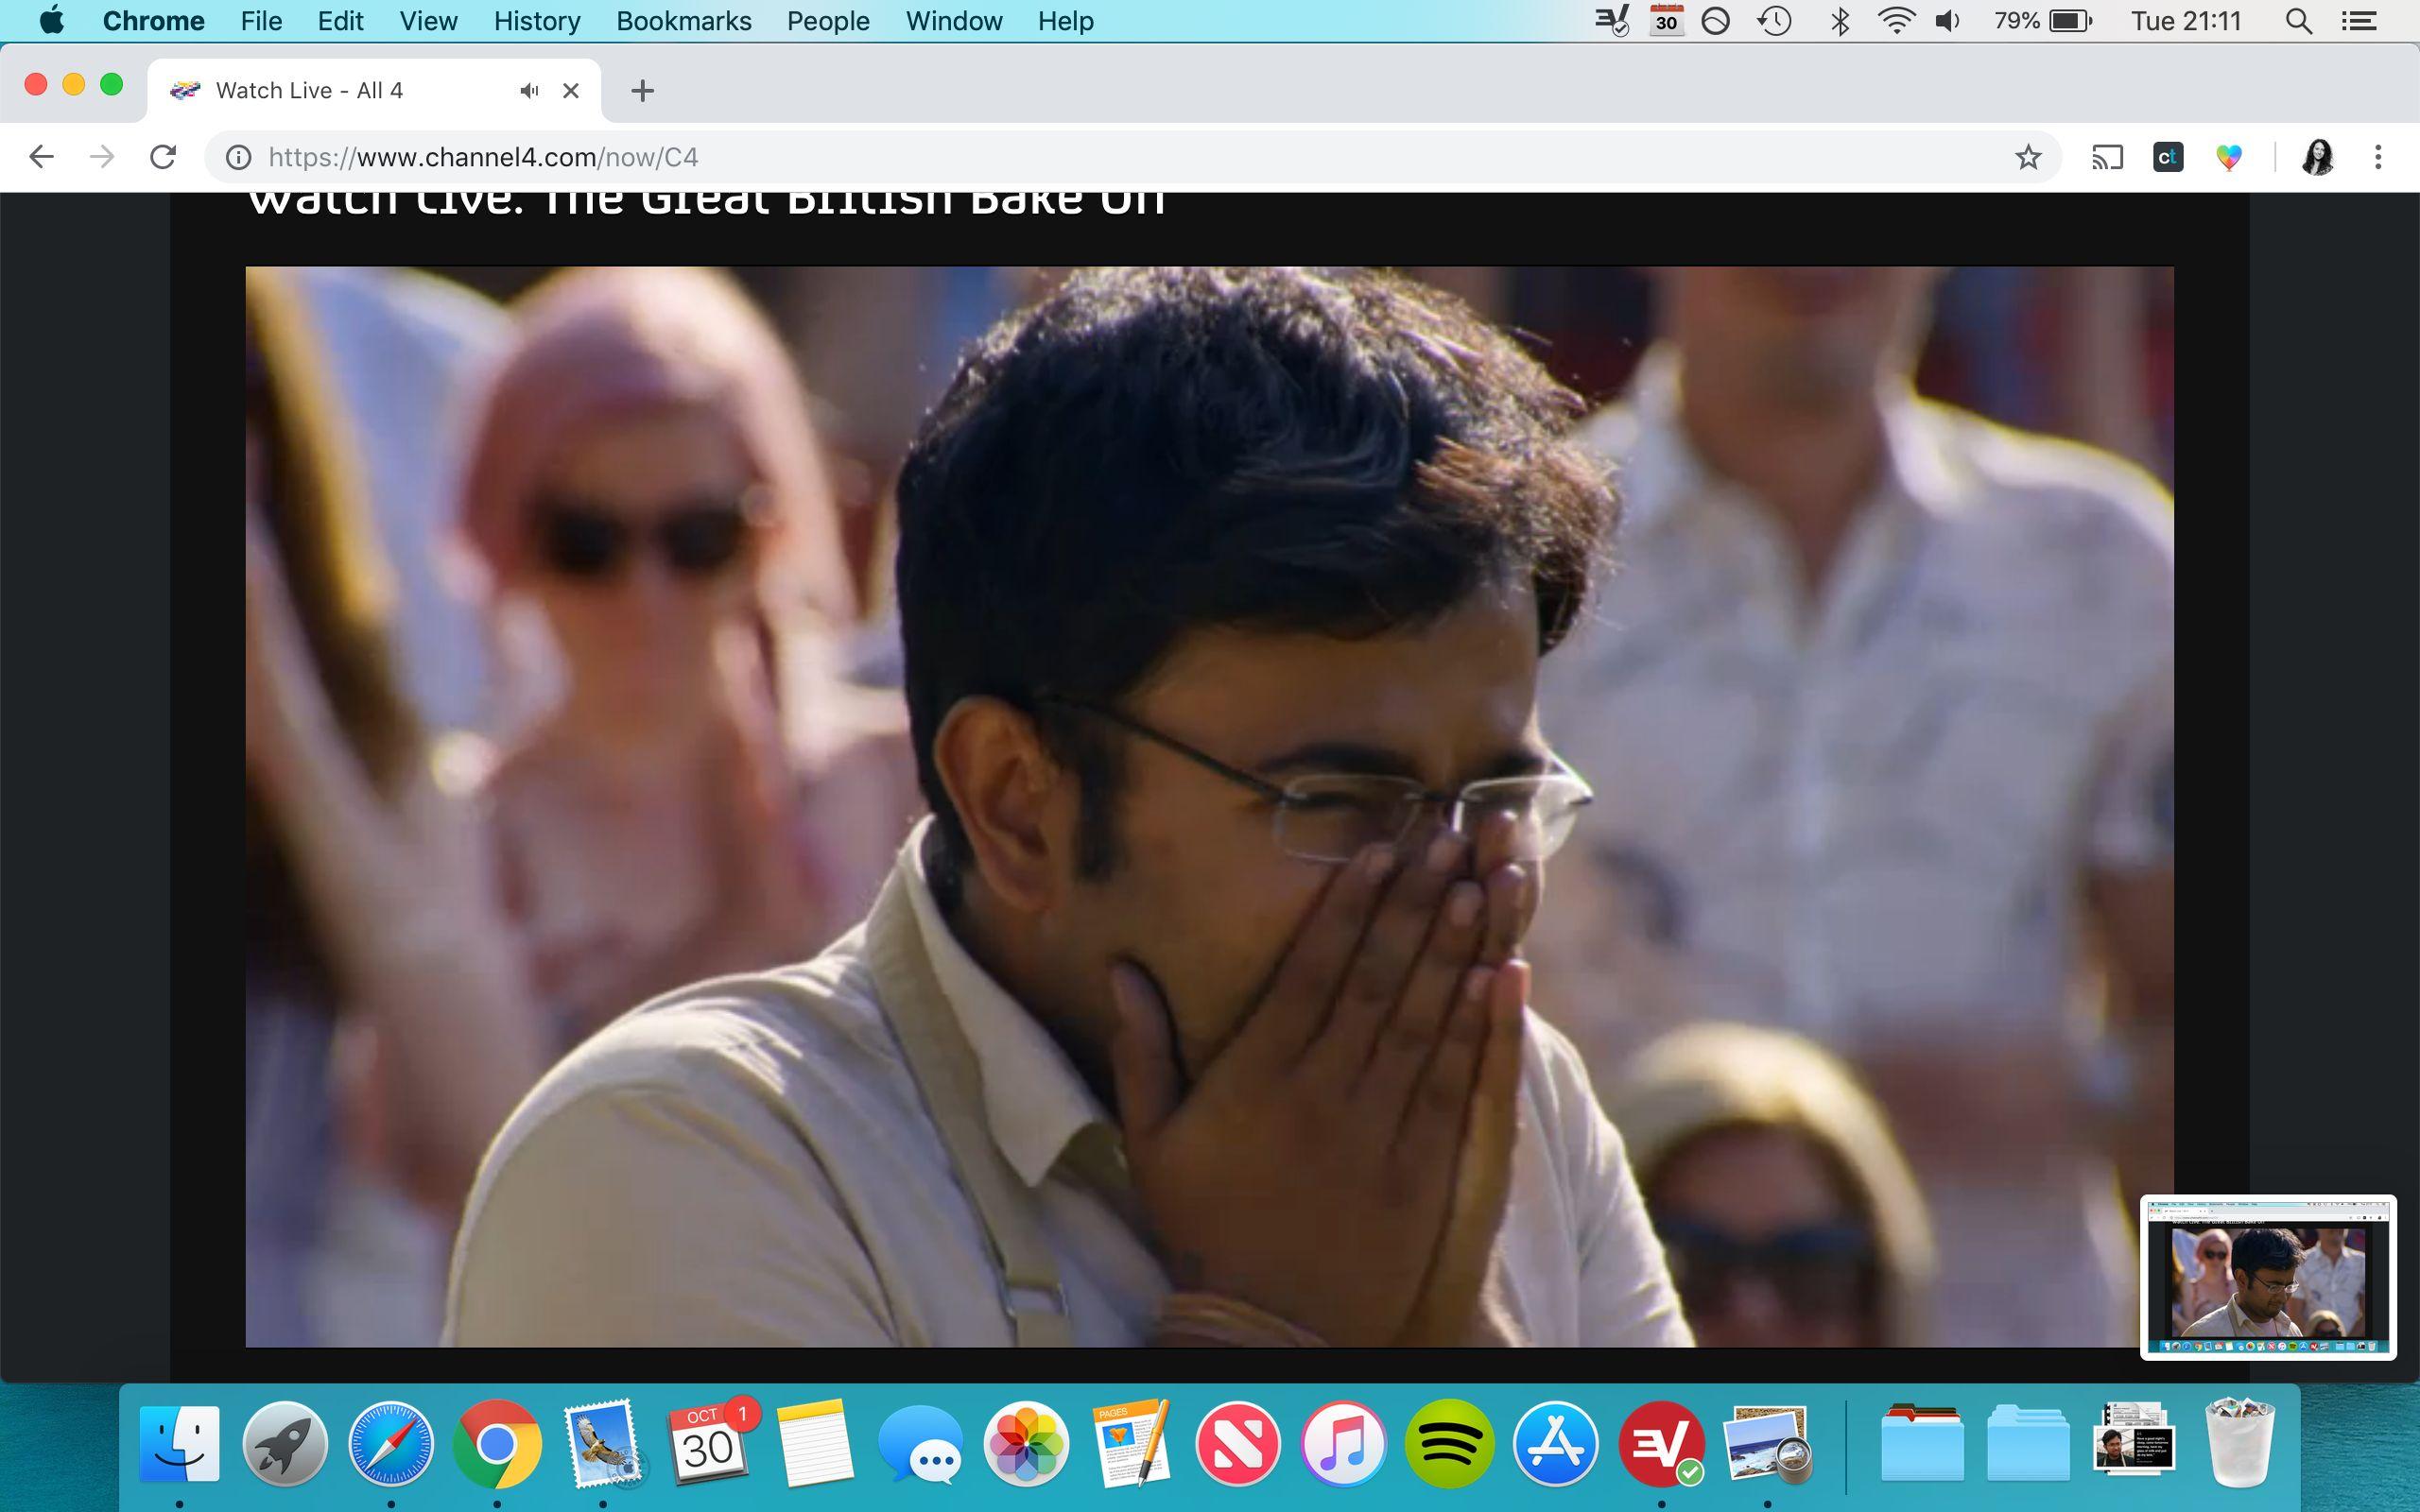 Rahul Mandal was won 'The Great British Bake Off' 2018